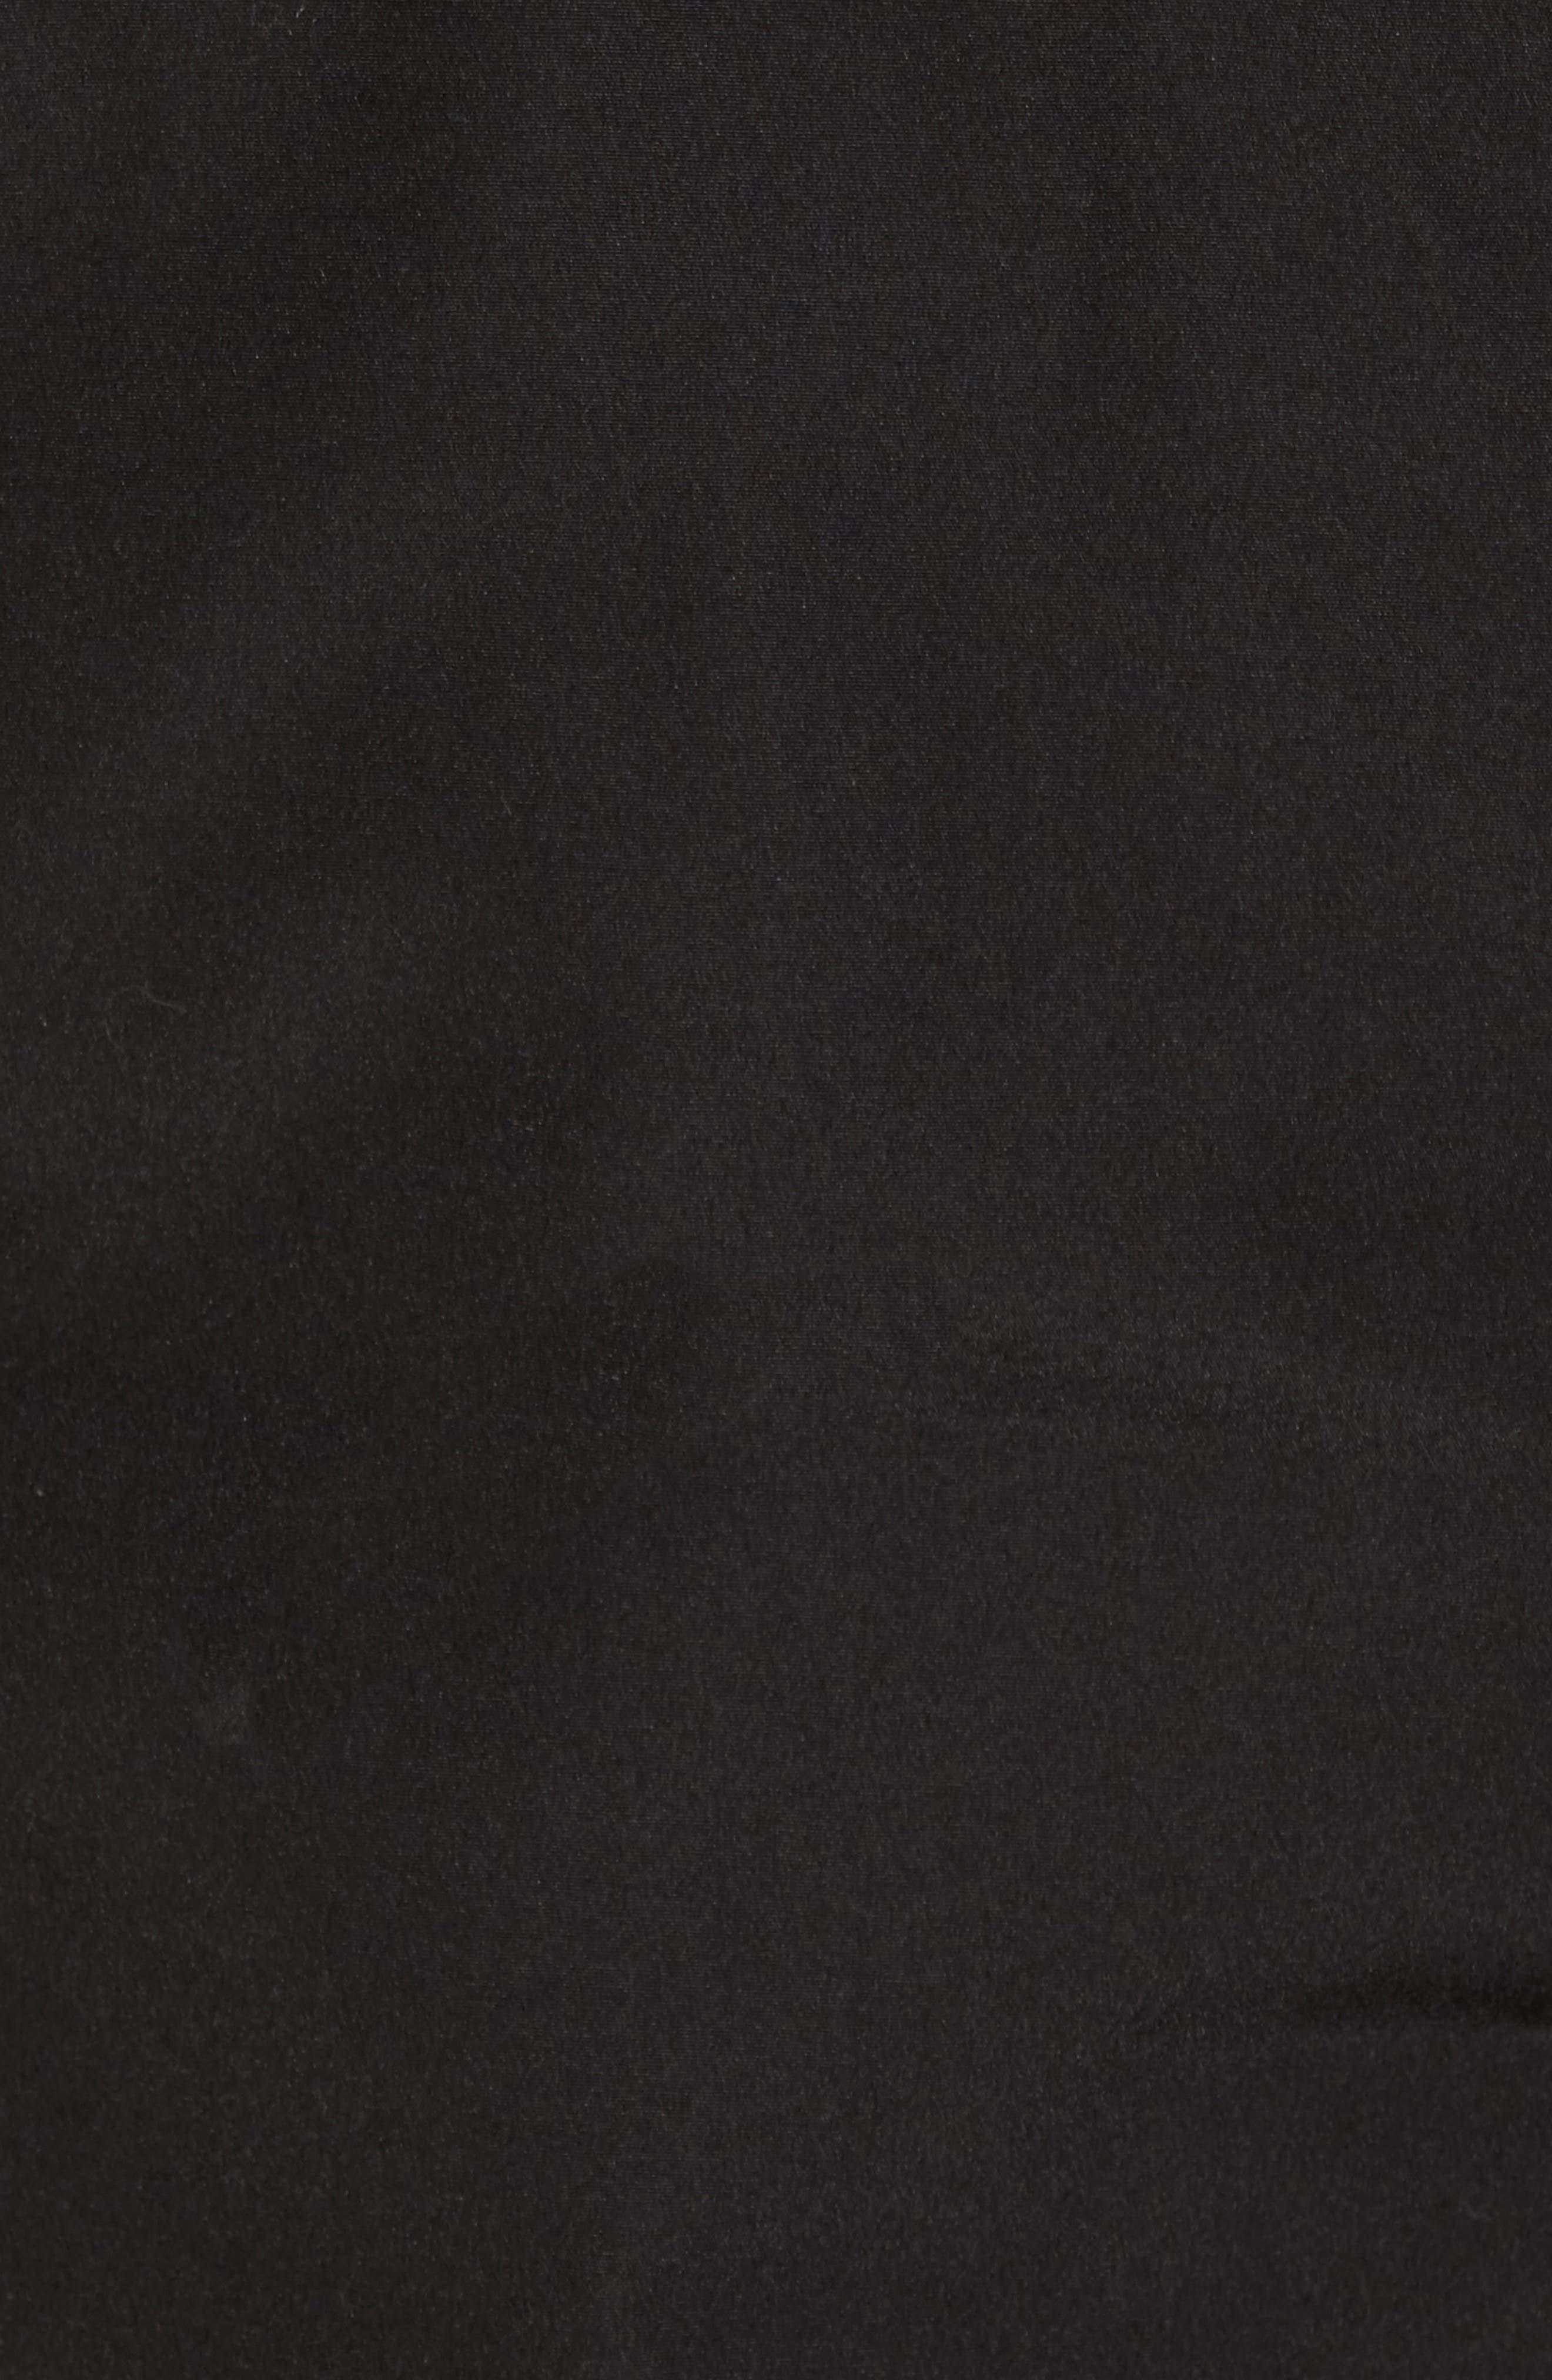 Langford Trim Fit Parka with Genuine Coyote Fur Trim,                             Alternate thumbnail 5, color,                             Black